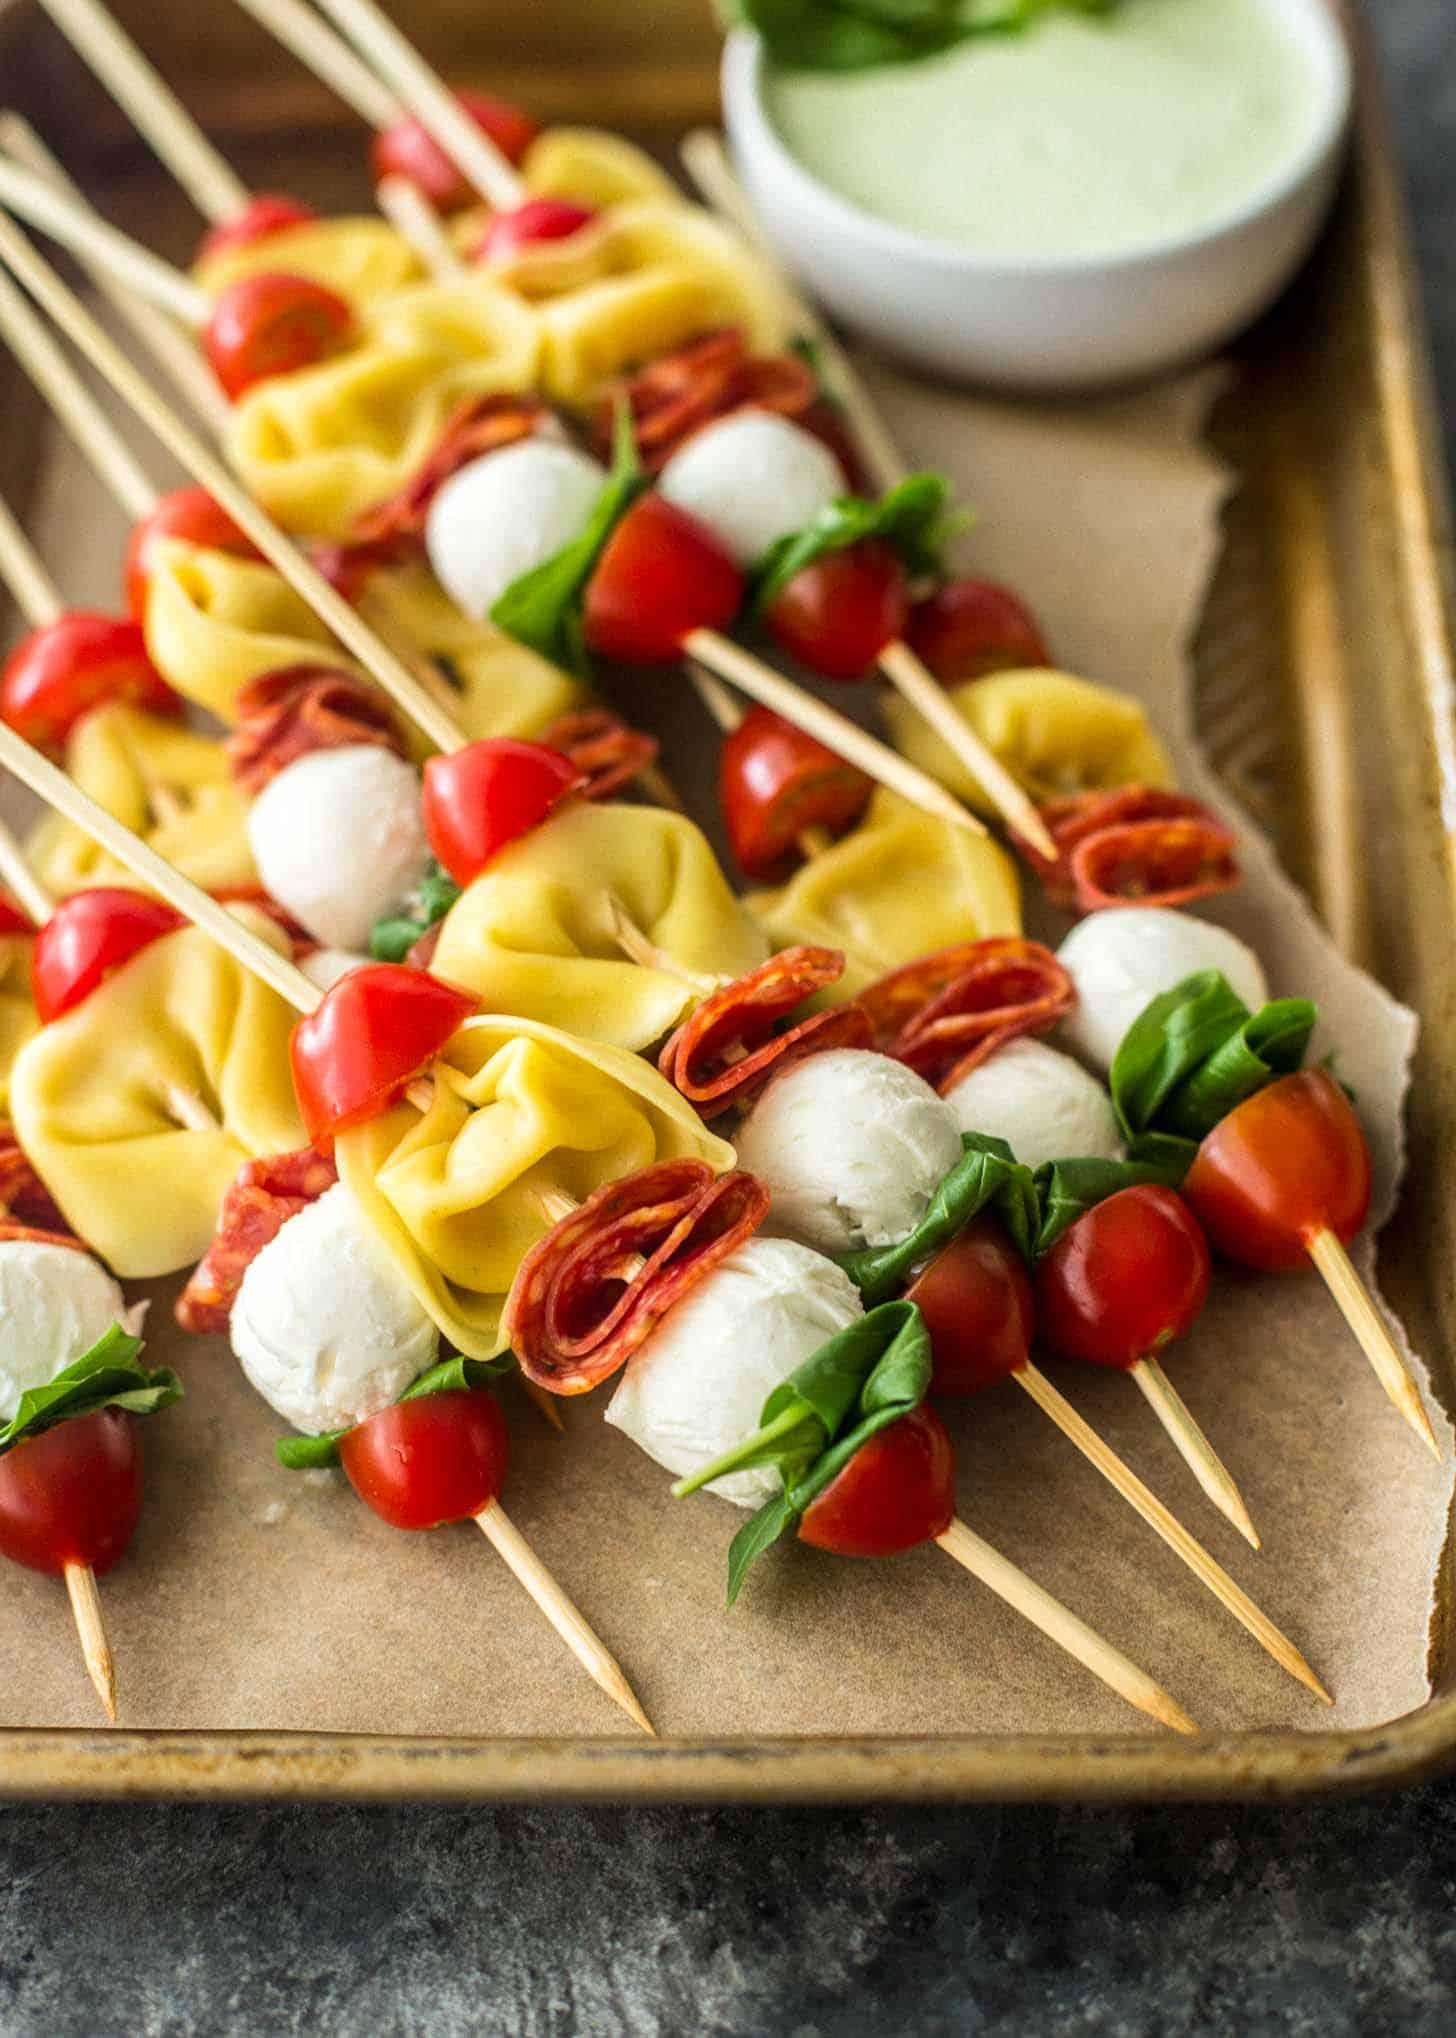 Pasta Salad Skewers close up